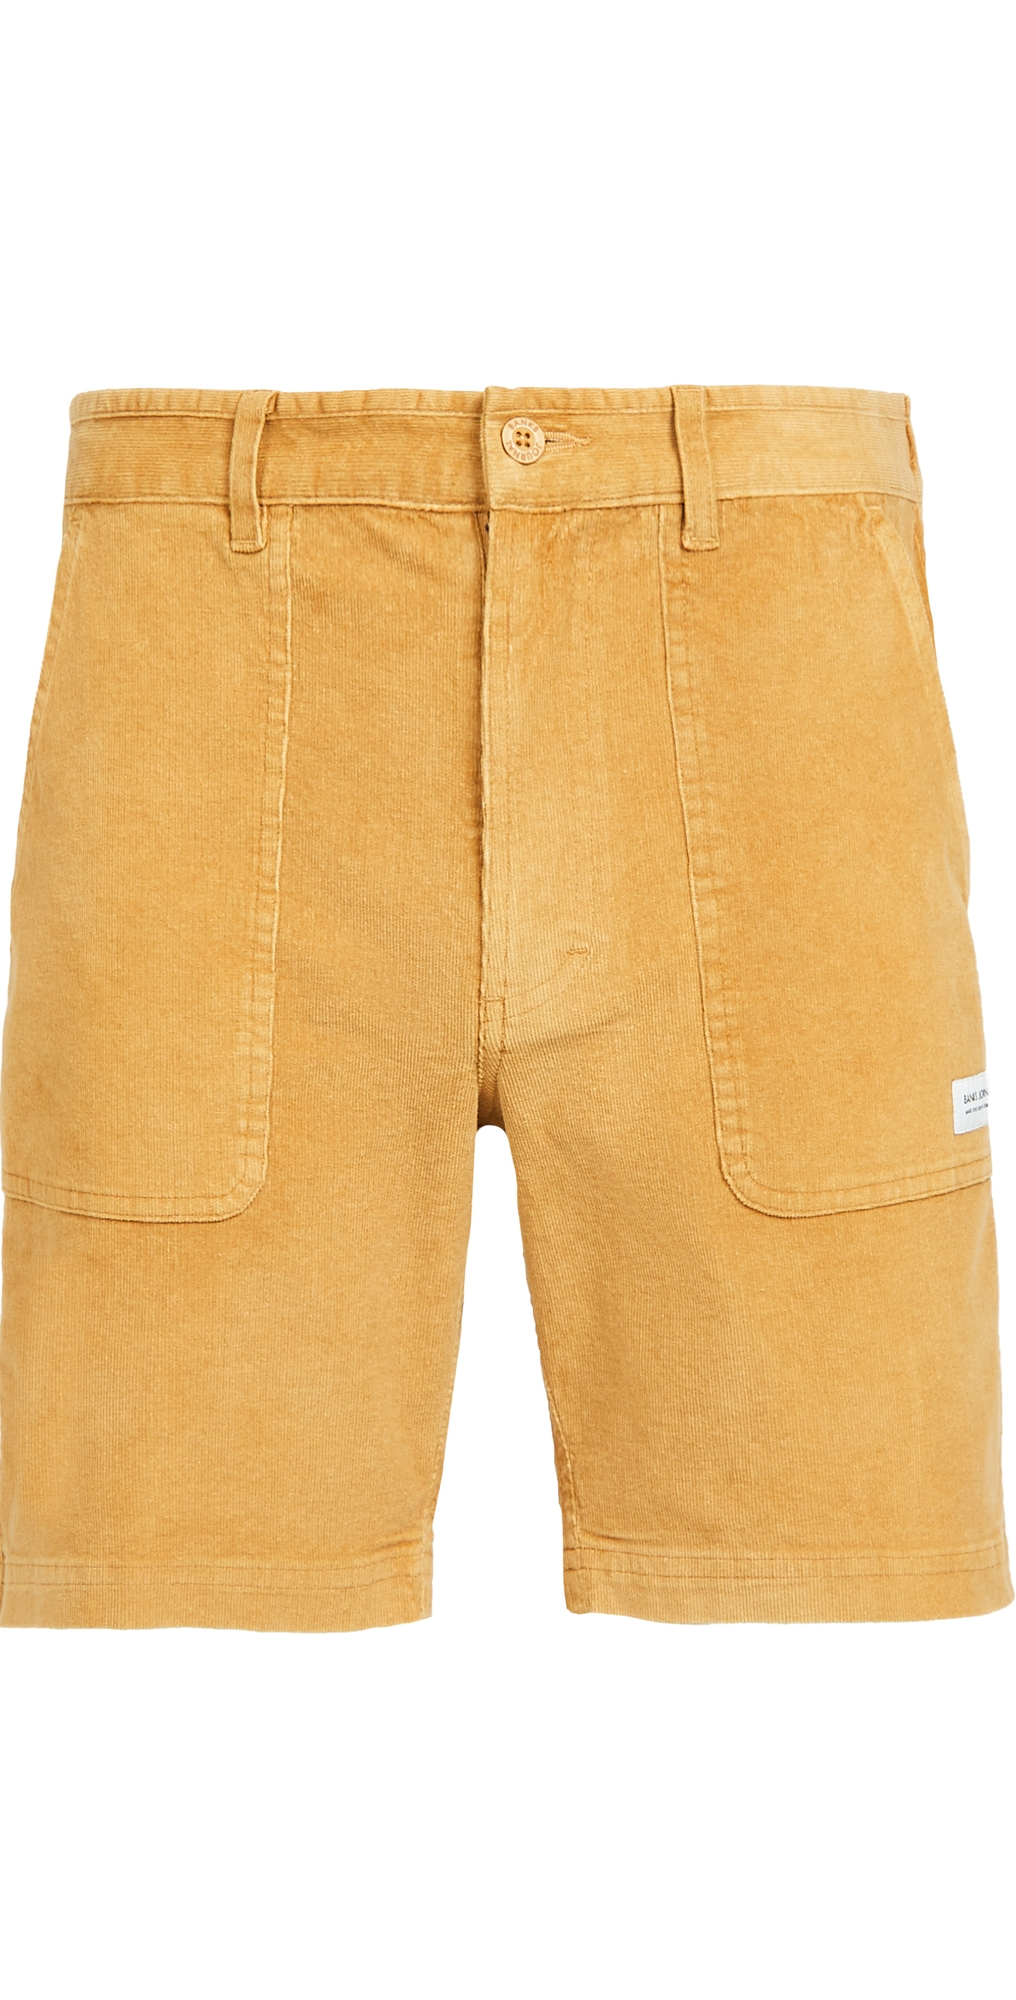 Big Bear Shorts